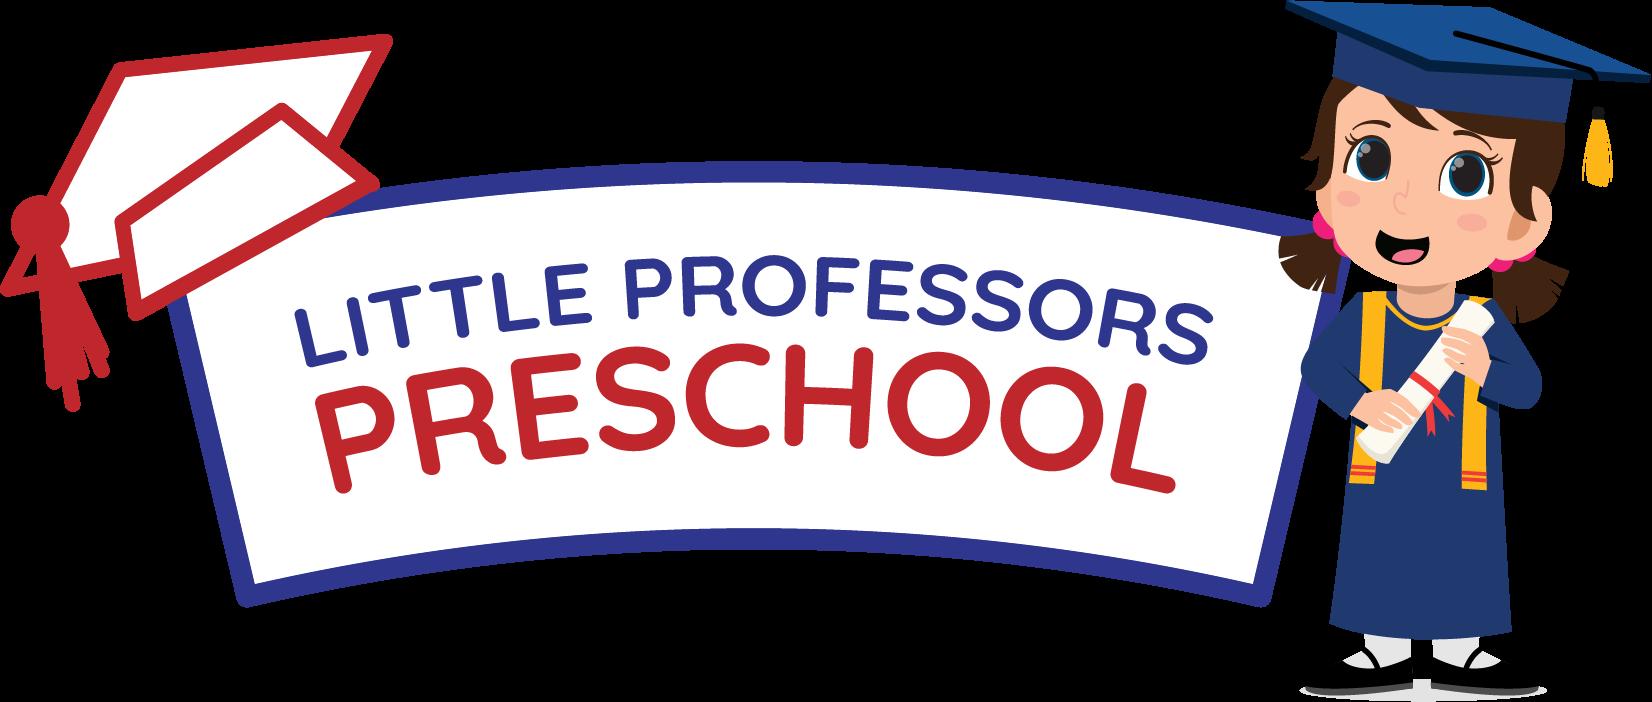 Little Professors Preschool